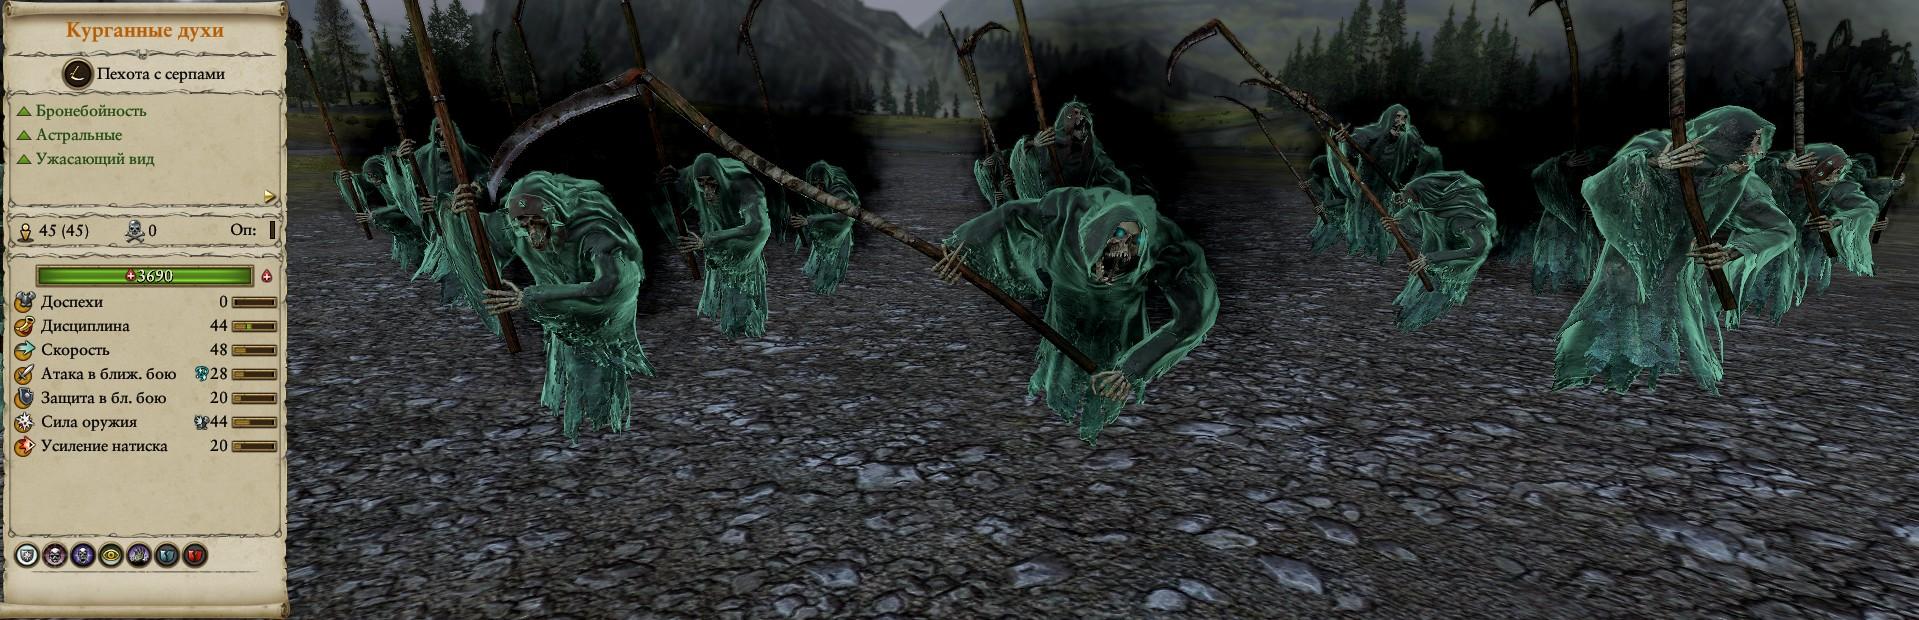 Отряды вампиров в warhammer